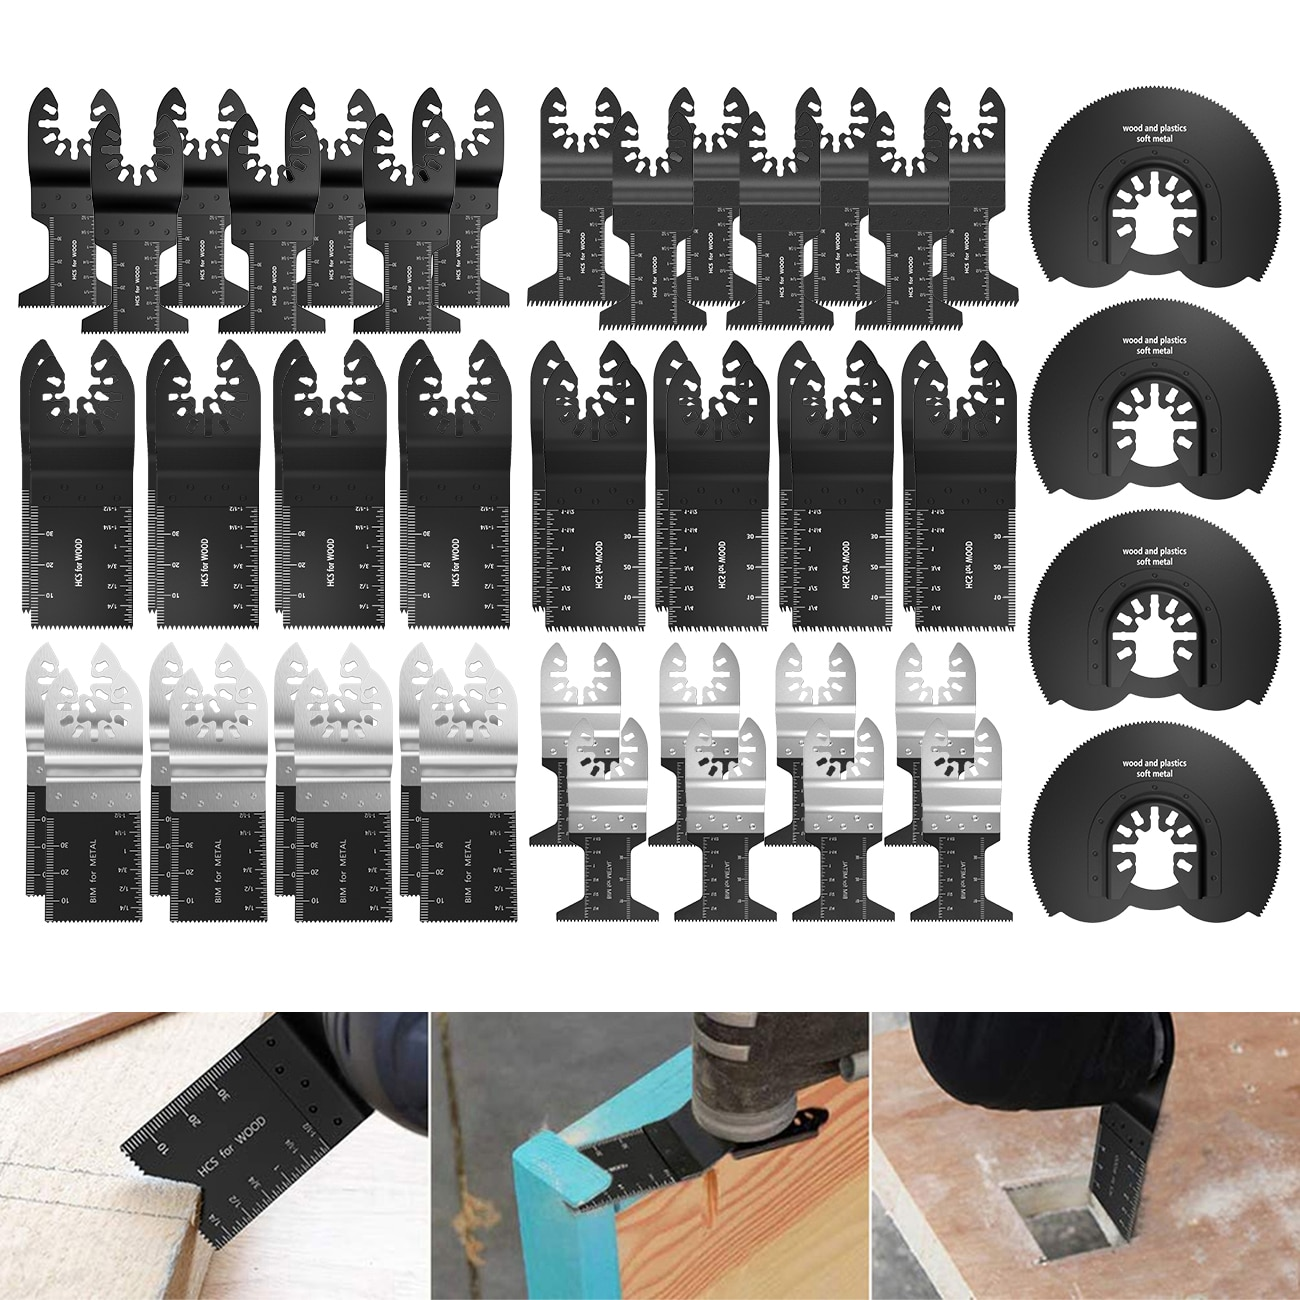 50 pçs oscilante multi ferramenta lâmina de serra para fein bosch multi mestre makita ferramentas de corte madeira para dremel lâmina lâminas energia